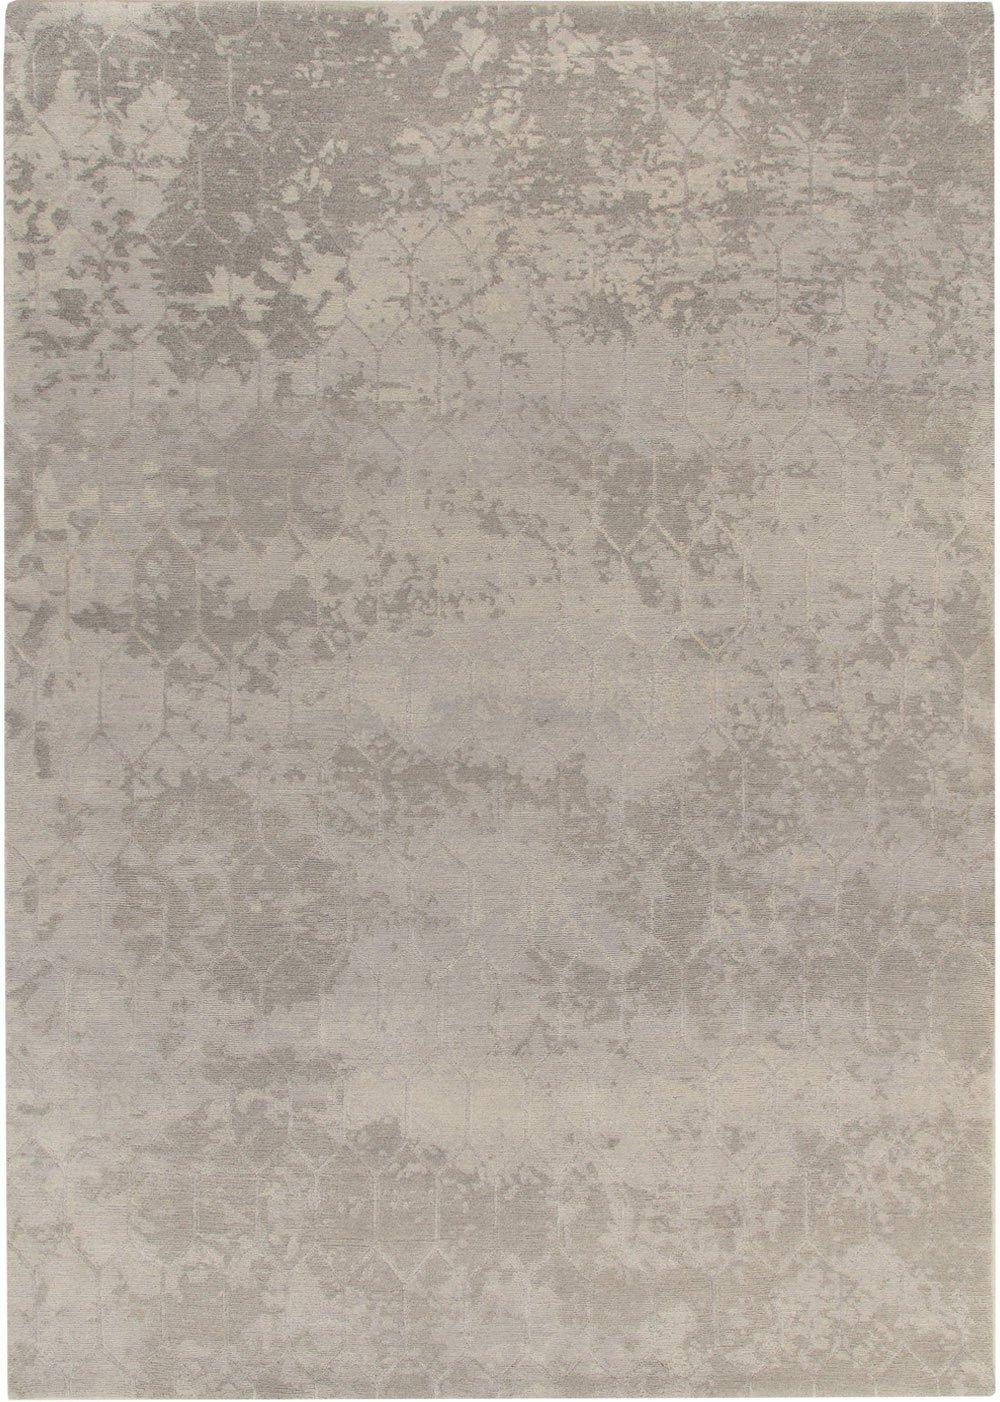 La Datina taranto carpet Gio Ponti